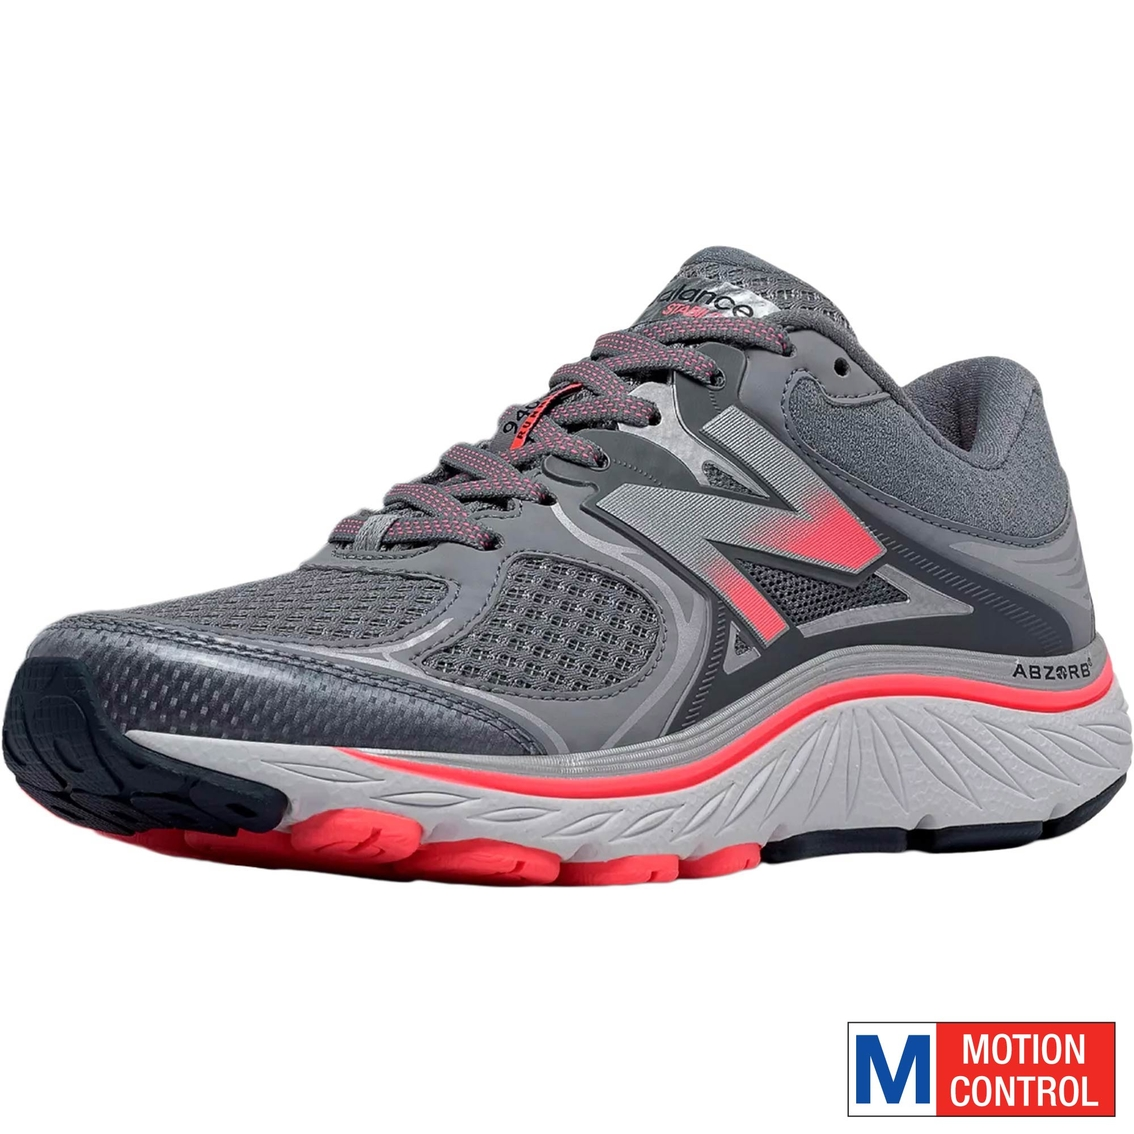 06aac58cf50e New Balance Women s W940gp3 Running Shoes